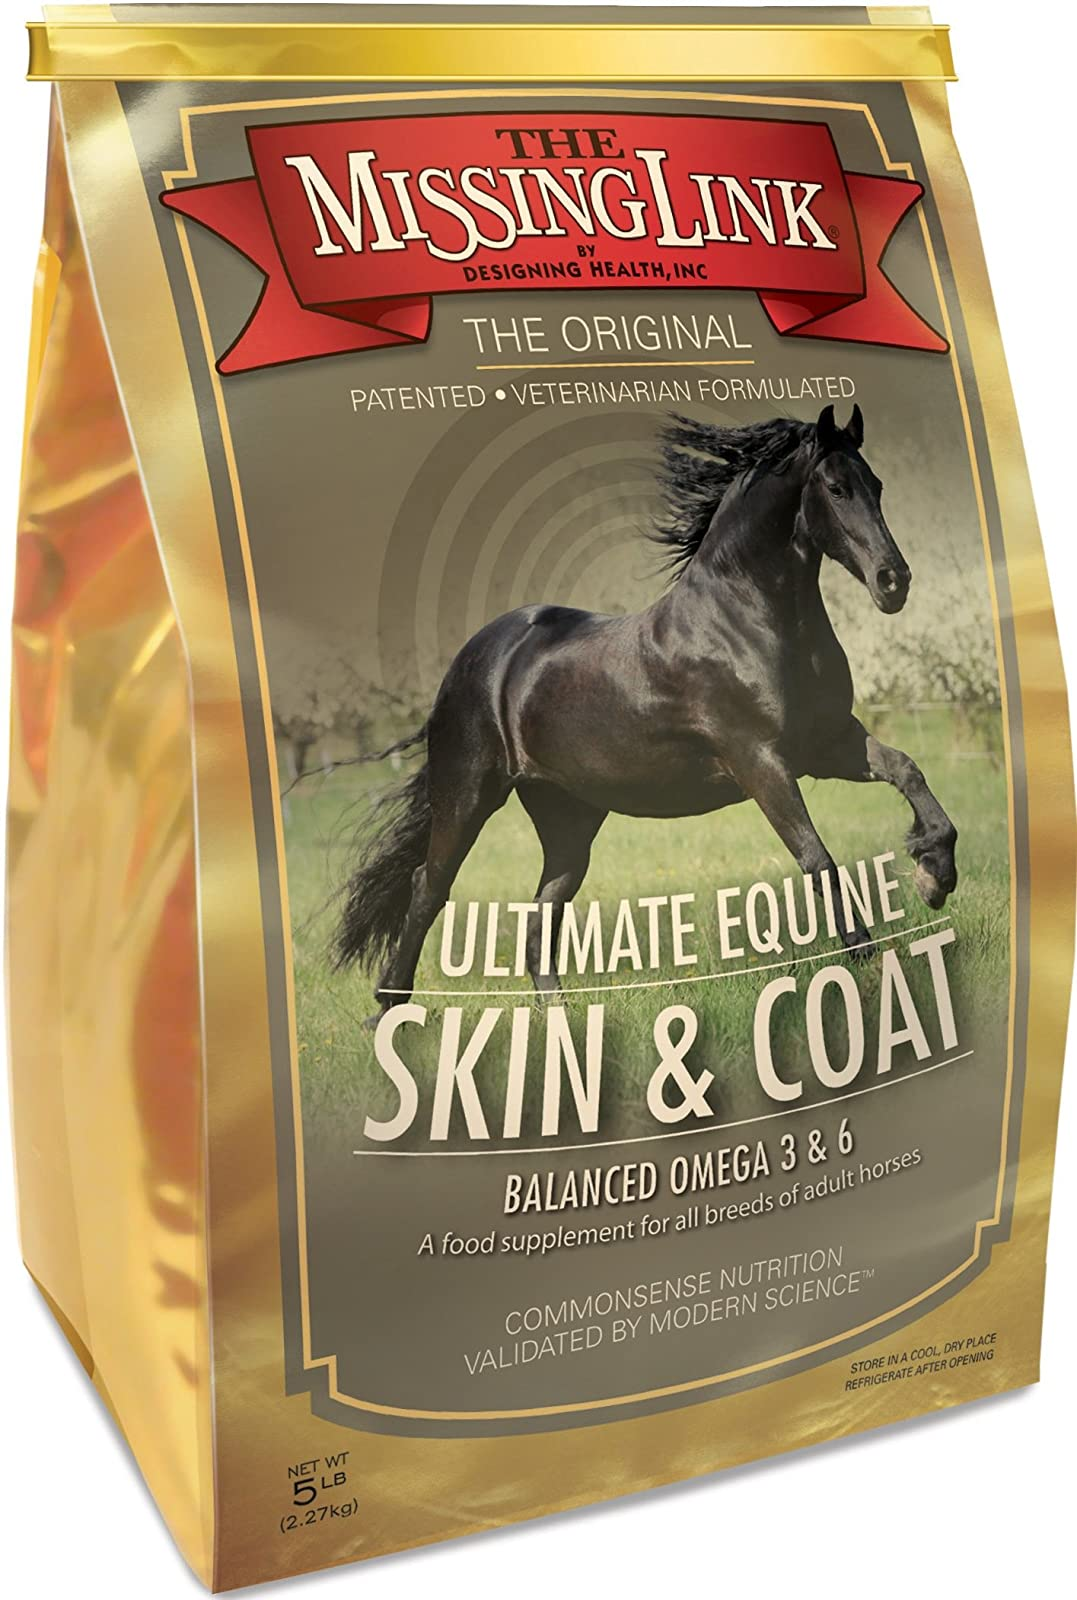 The Missing Link Ultimate Equine Skin & Coat 73011 - 1